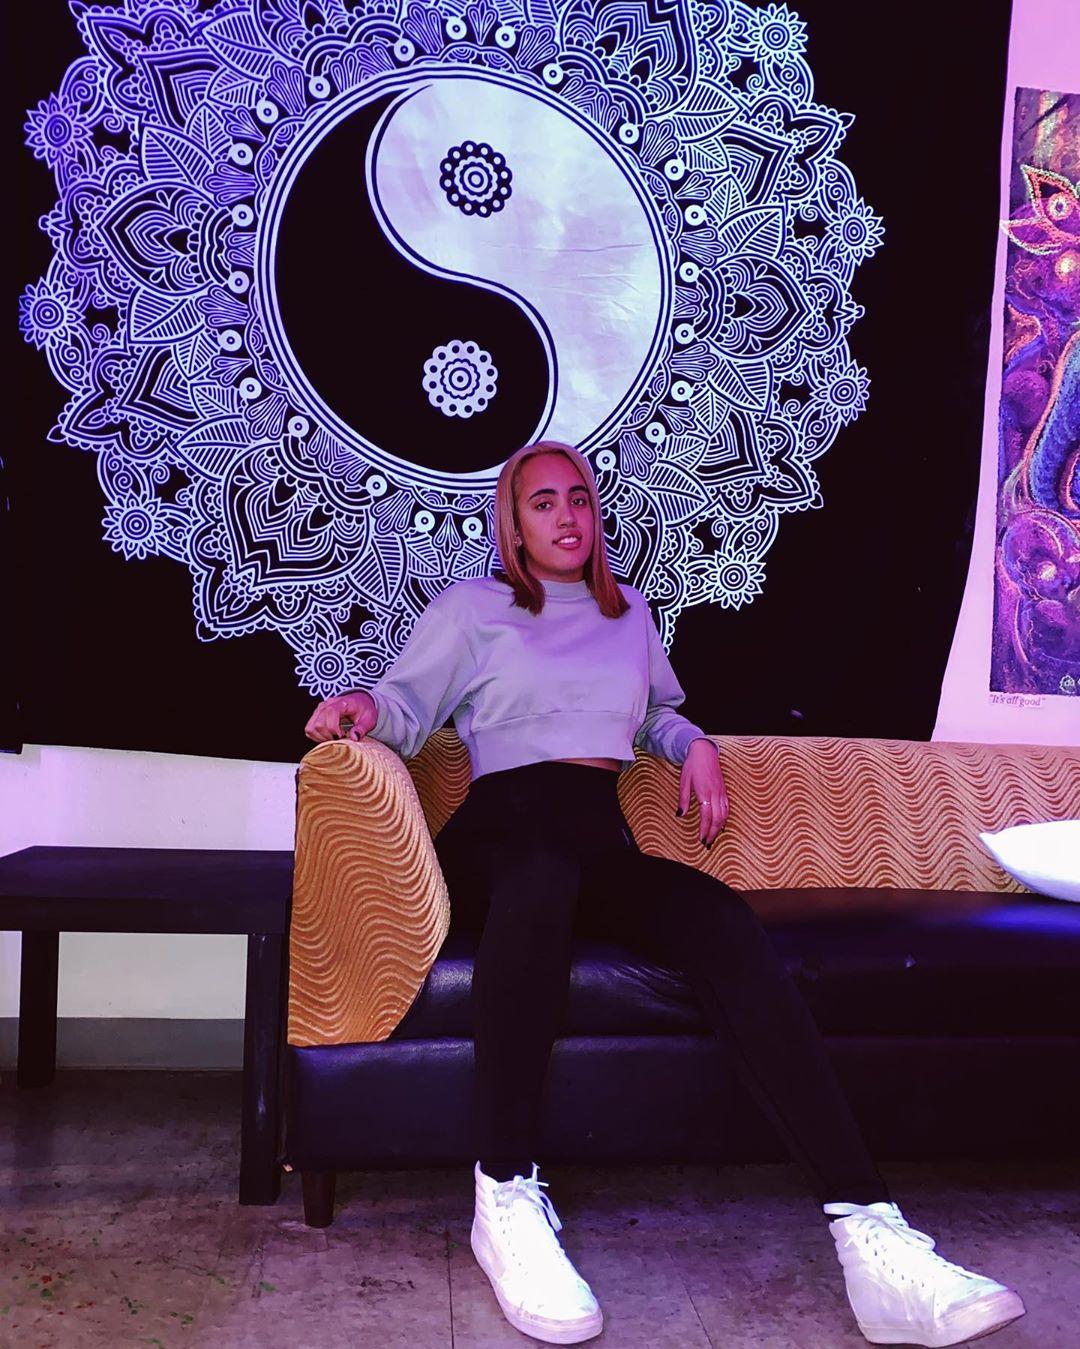 Симона Джонсон сидит на бежевом диване сзади символ инь-янь